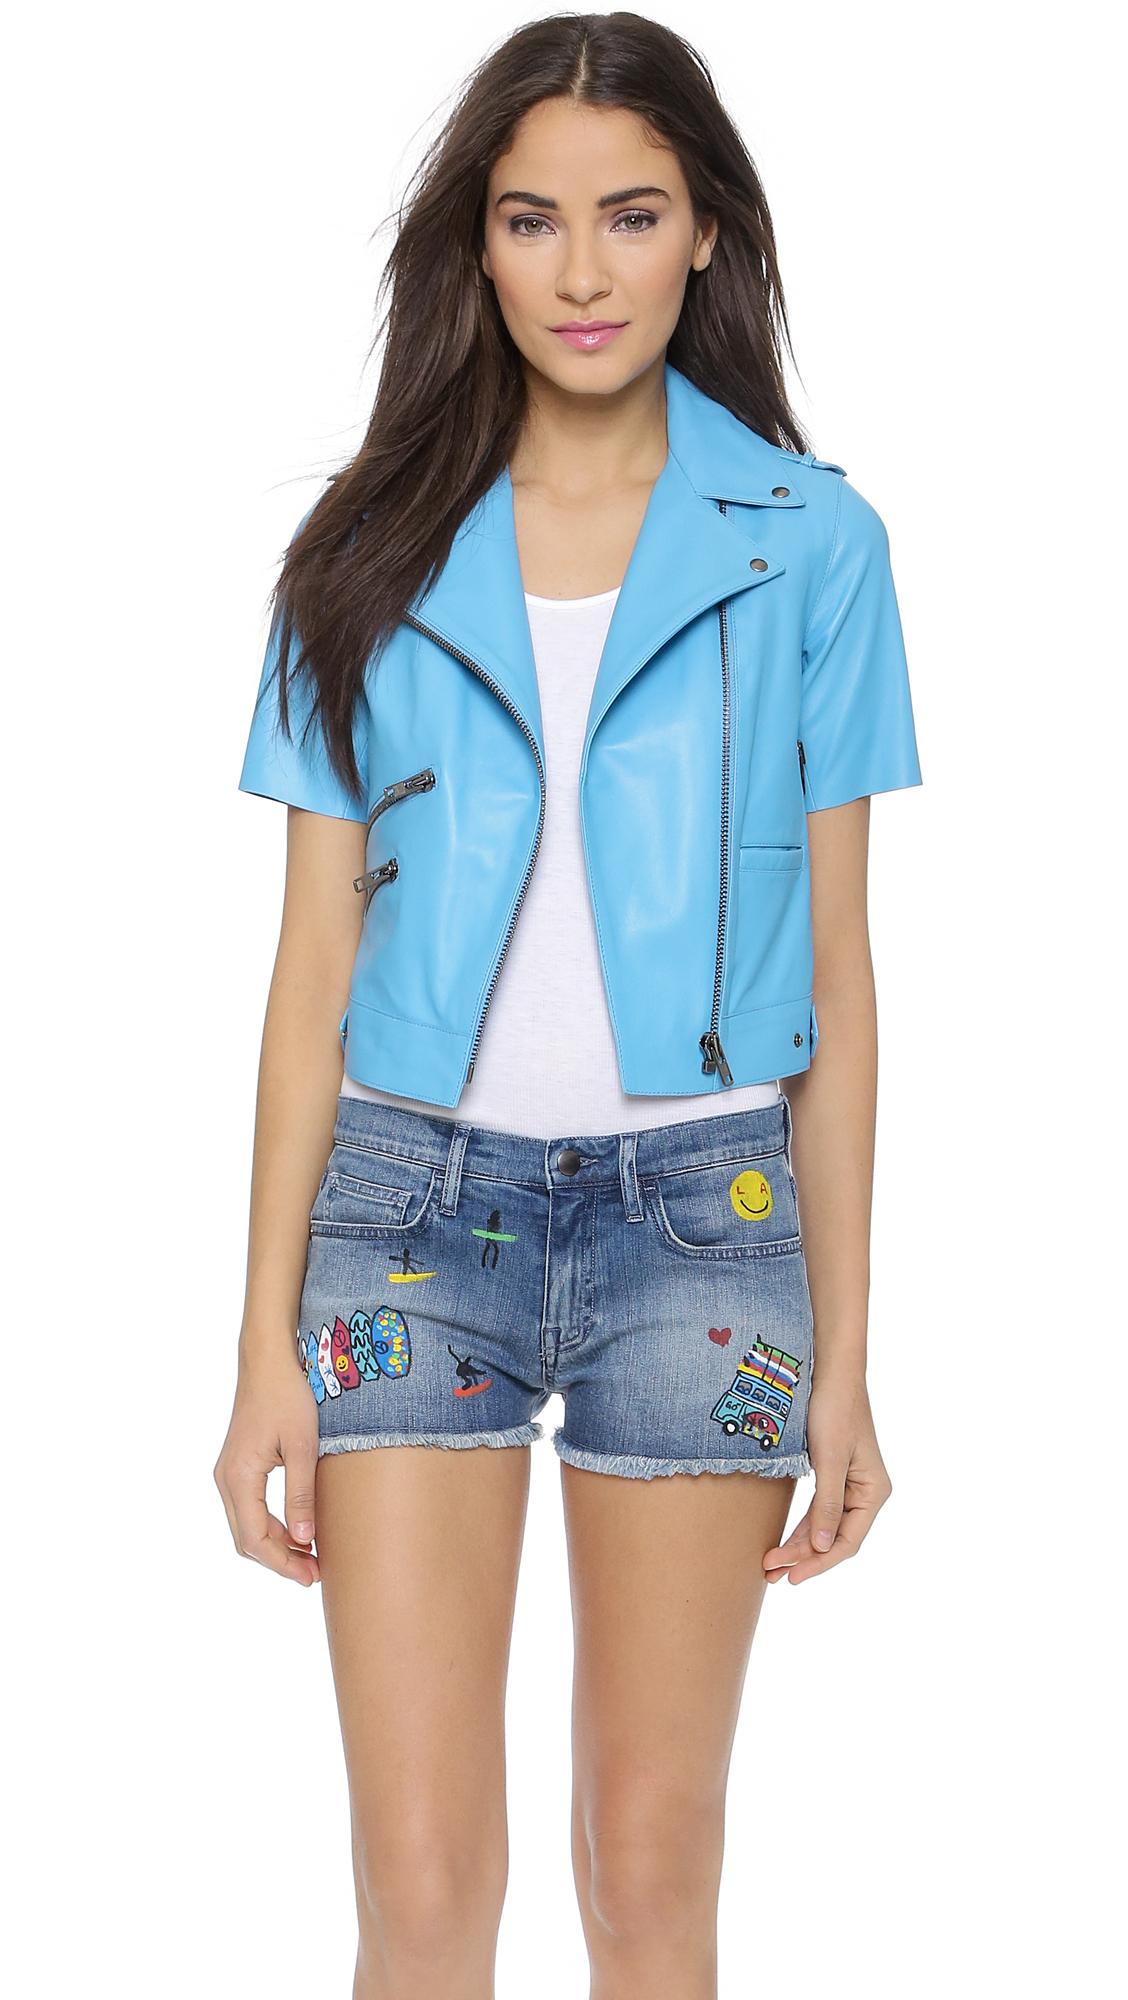 Mira mikati Short Sleeve Leather Jacket - Light Blue in Blue | Lyst